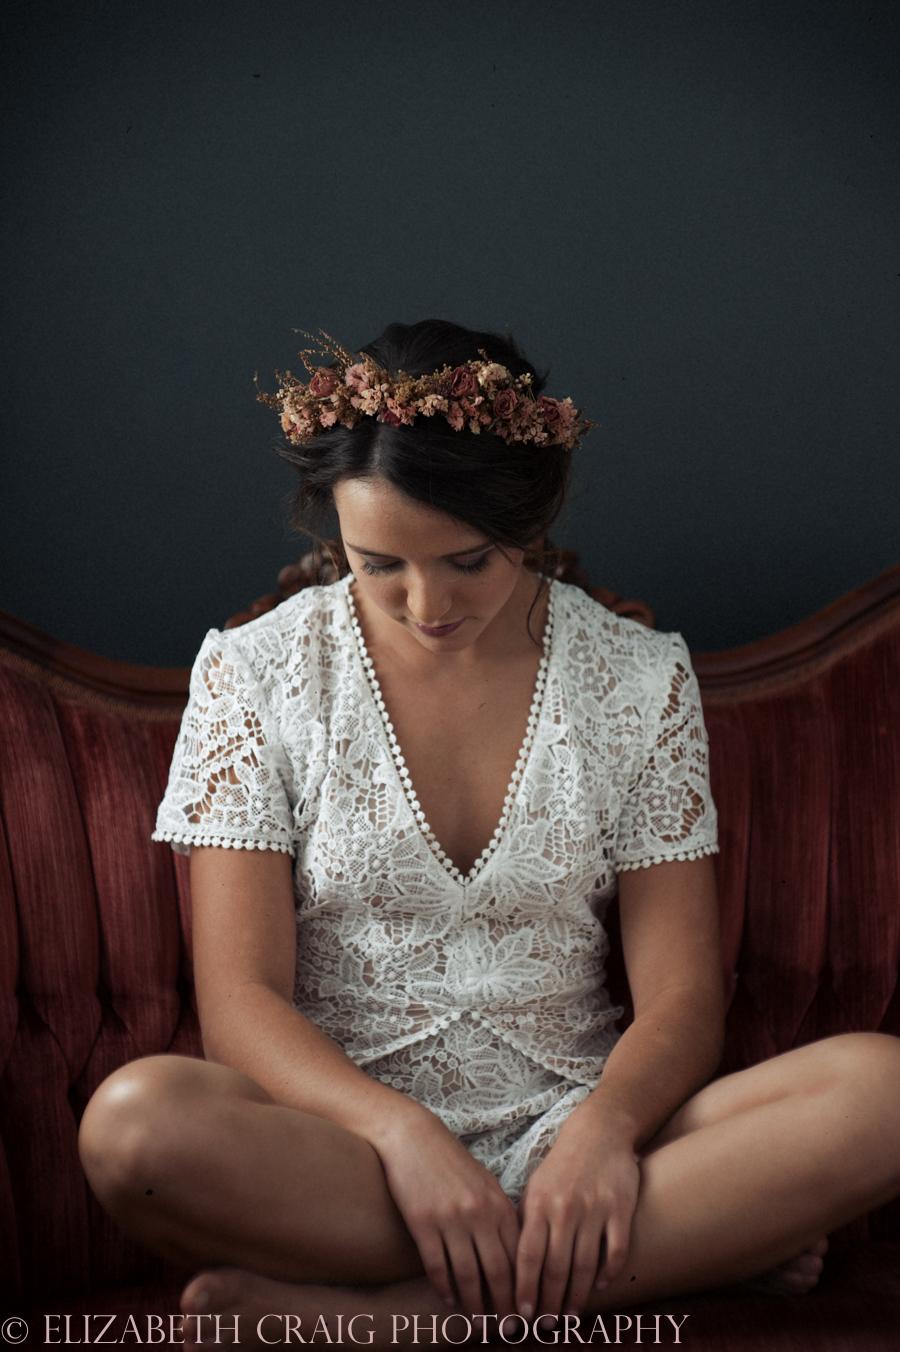 high-school-senior-photographer-pittsburgh-elizabeth-craig-photography-001